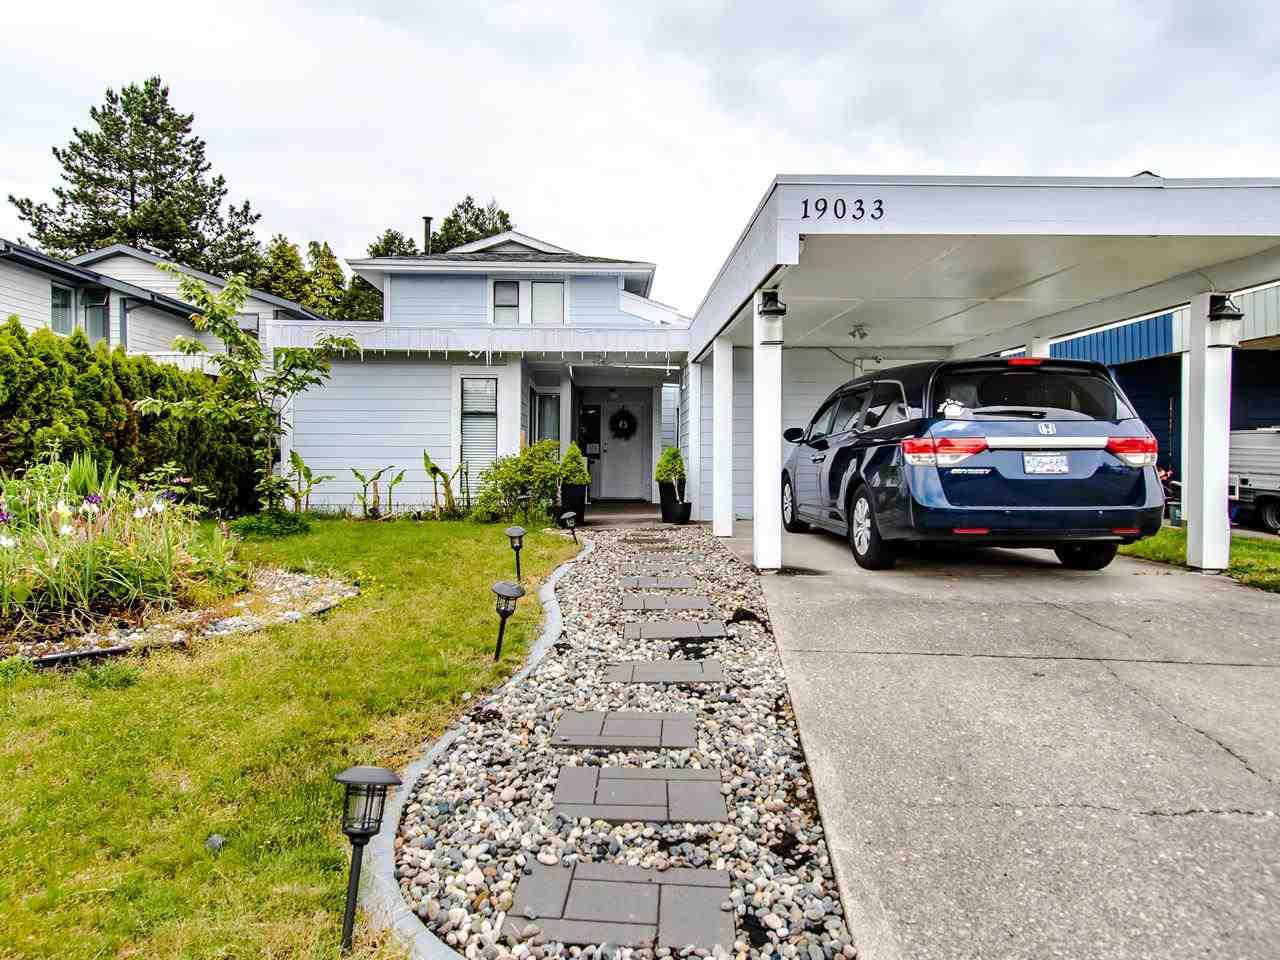 Main Photo: 19033 117A Avenue in Pitt Meadows: Central Meadows House for sale : MLS®# R2465781